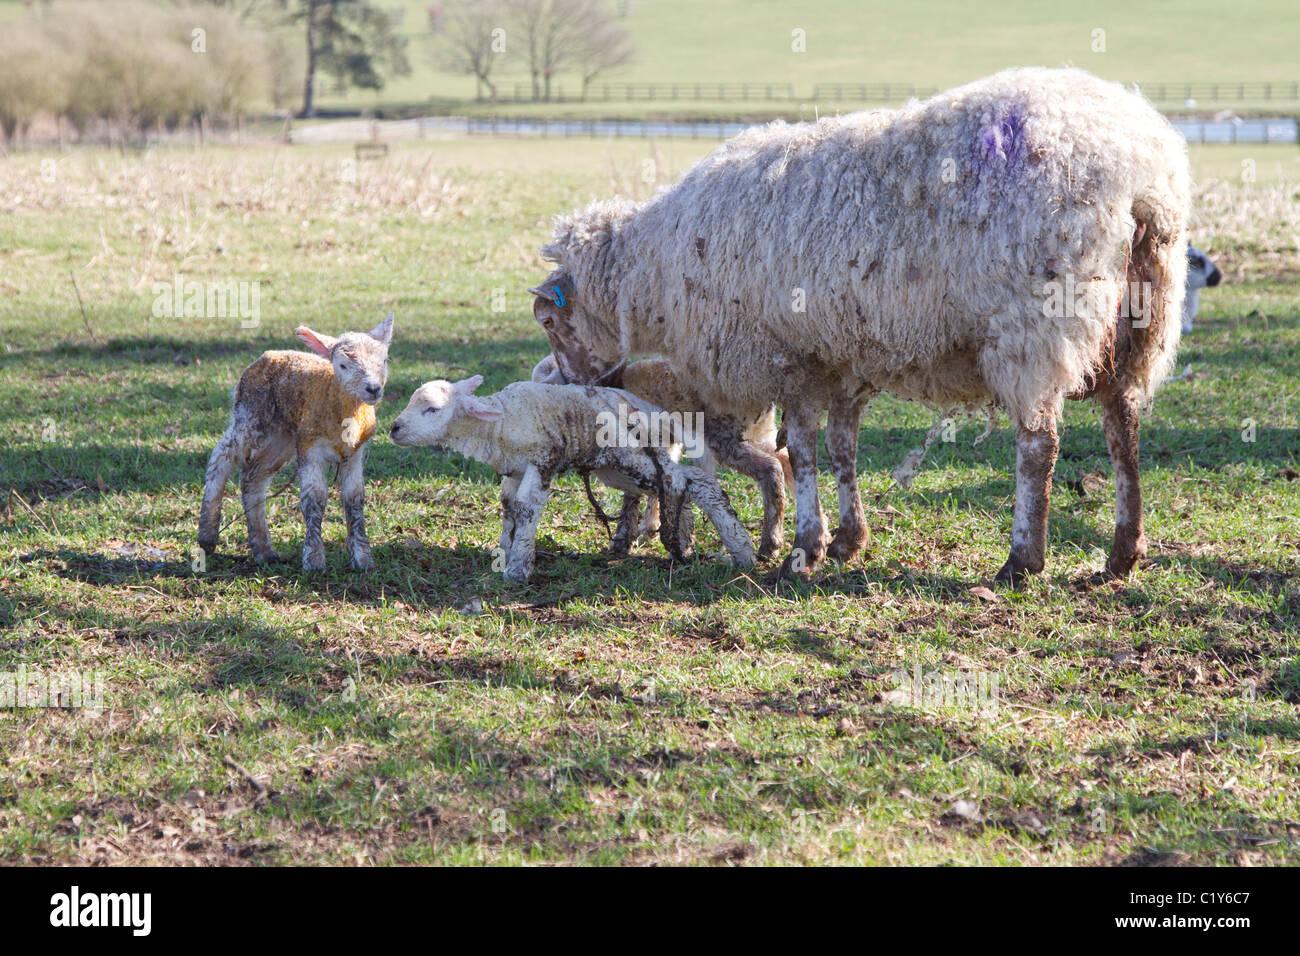 ewe with newborn lambs - Stock Image